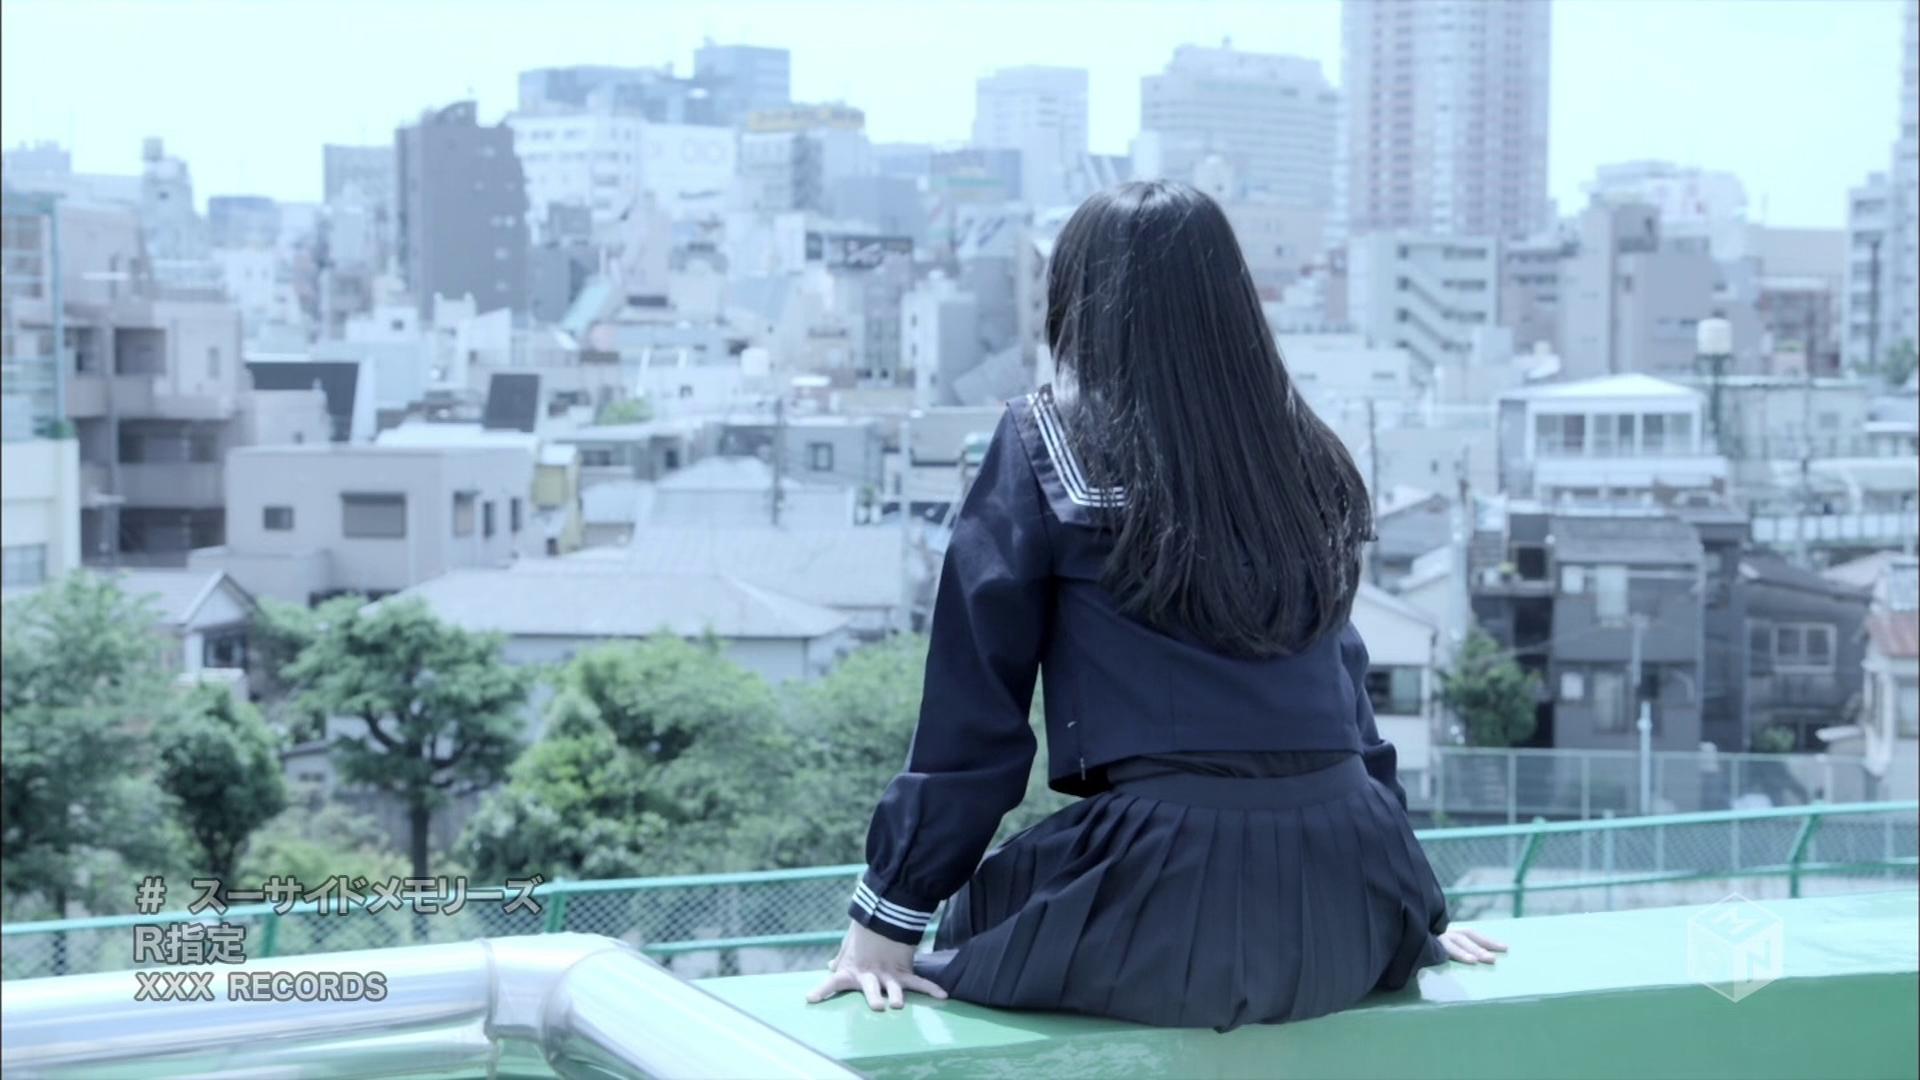 20161116.03.19 R Shitei - Suicide Memories (PV) (JPOP.ru).ts 2.jpg